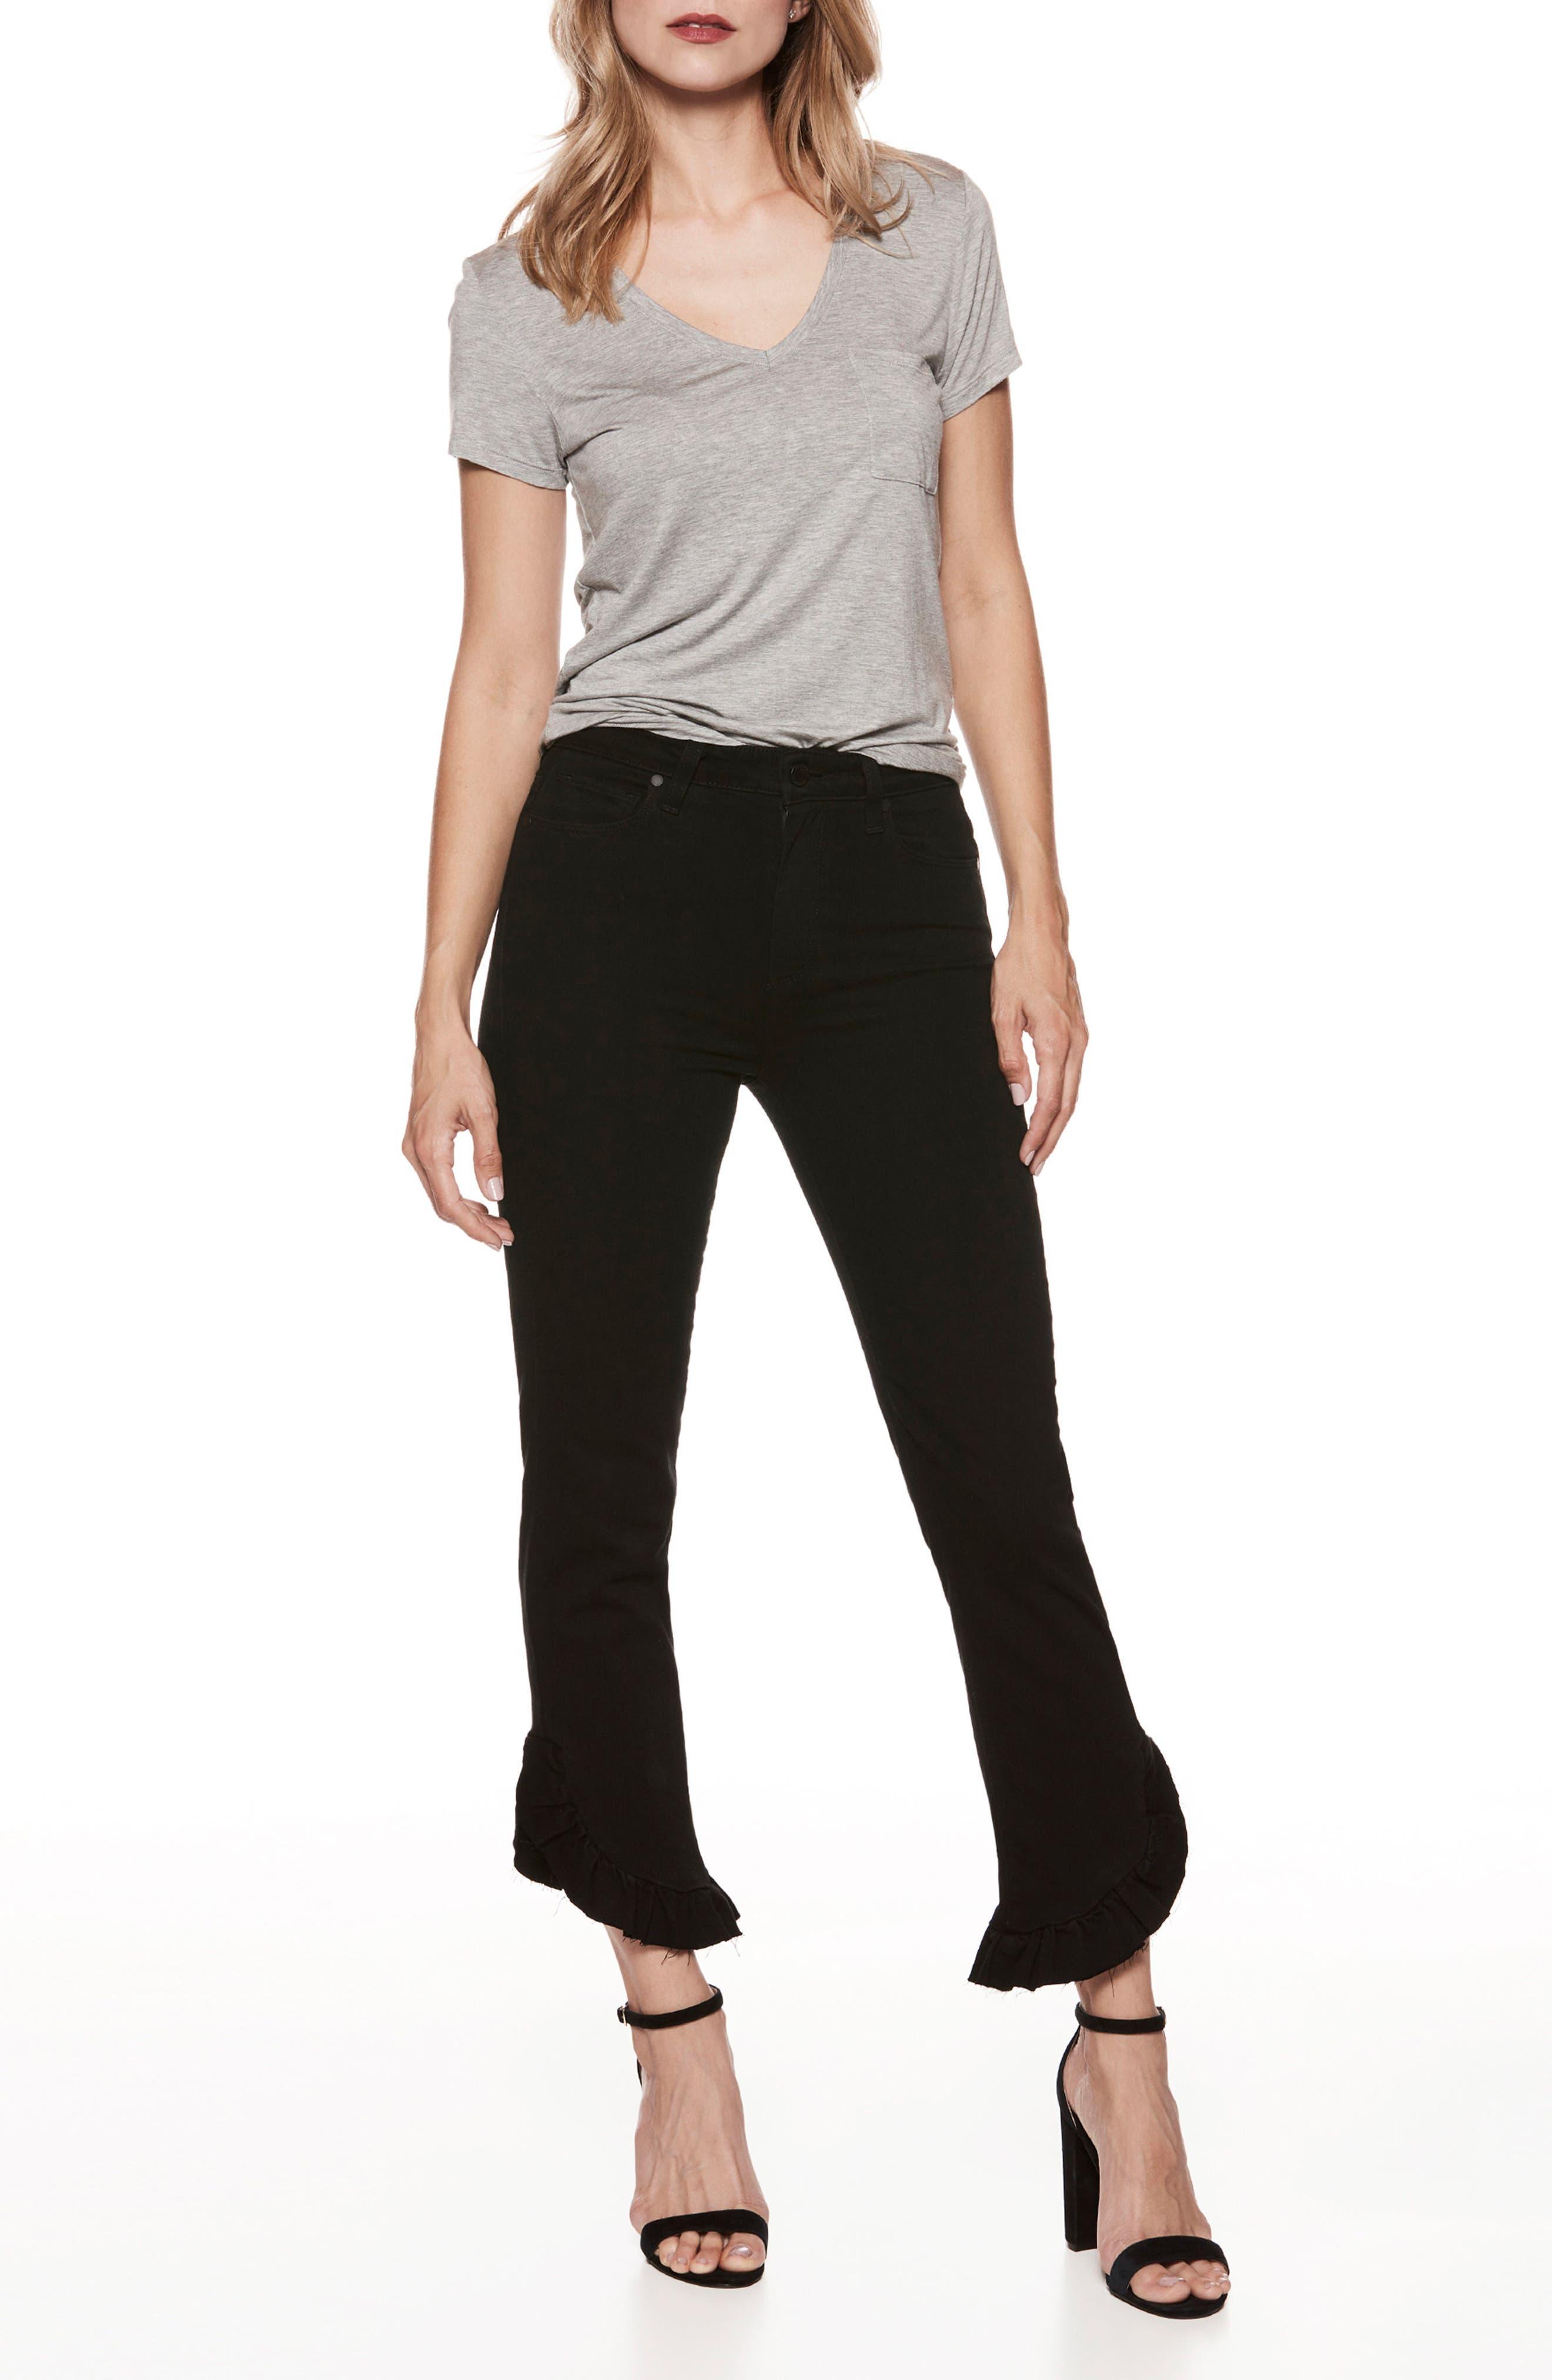 Transcend - Hoxton High Waist Ankle Straight Leg Jeans,                             Alternate thumbnail 4, color,                             001